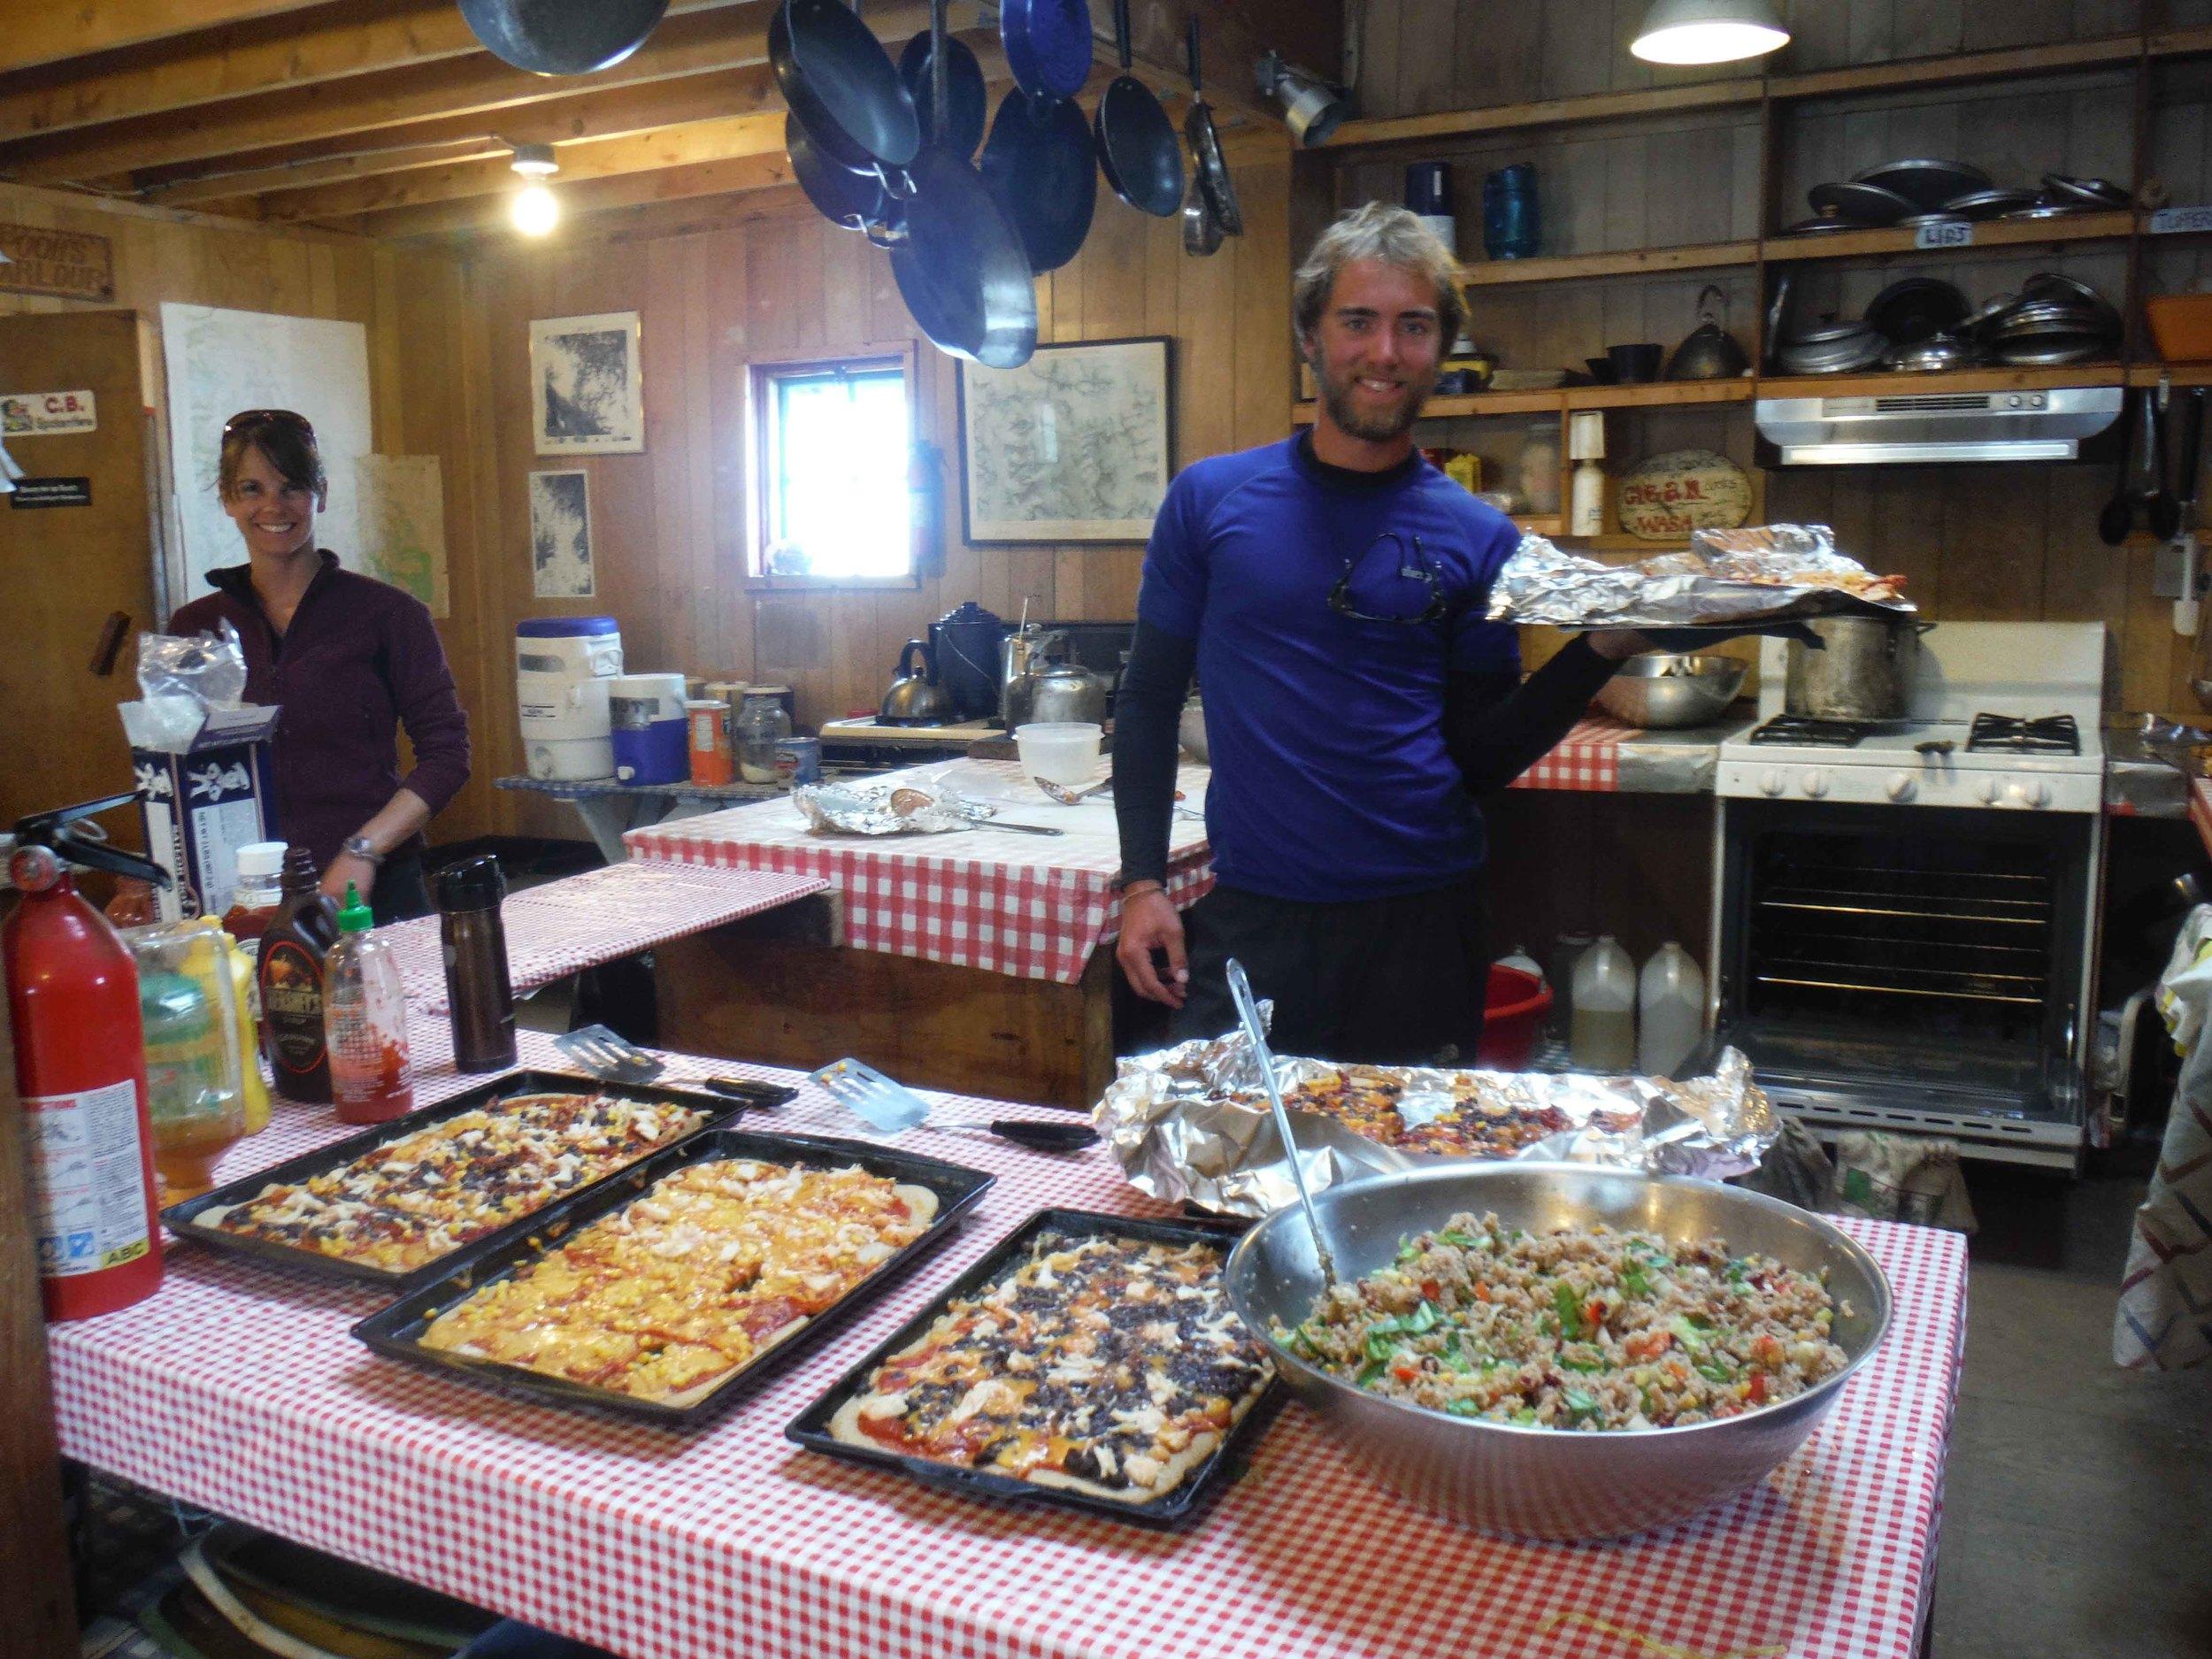 A happy chef (Jon Doty) always makes the meal better. Photo by Sarah Bouckoms